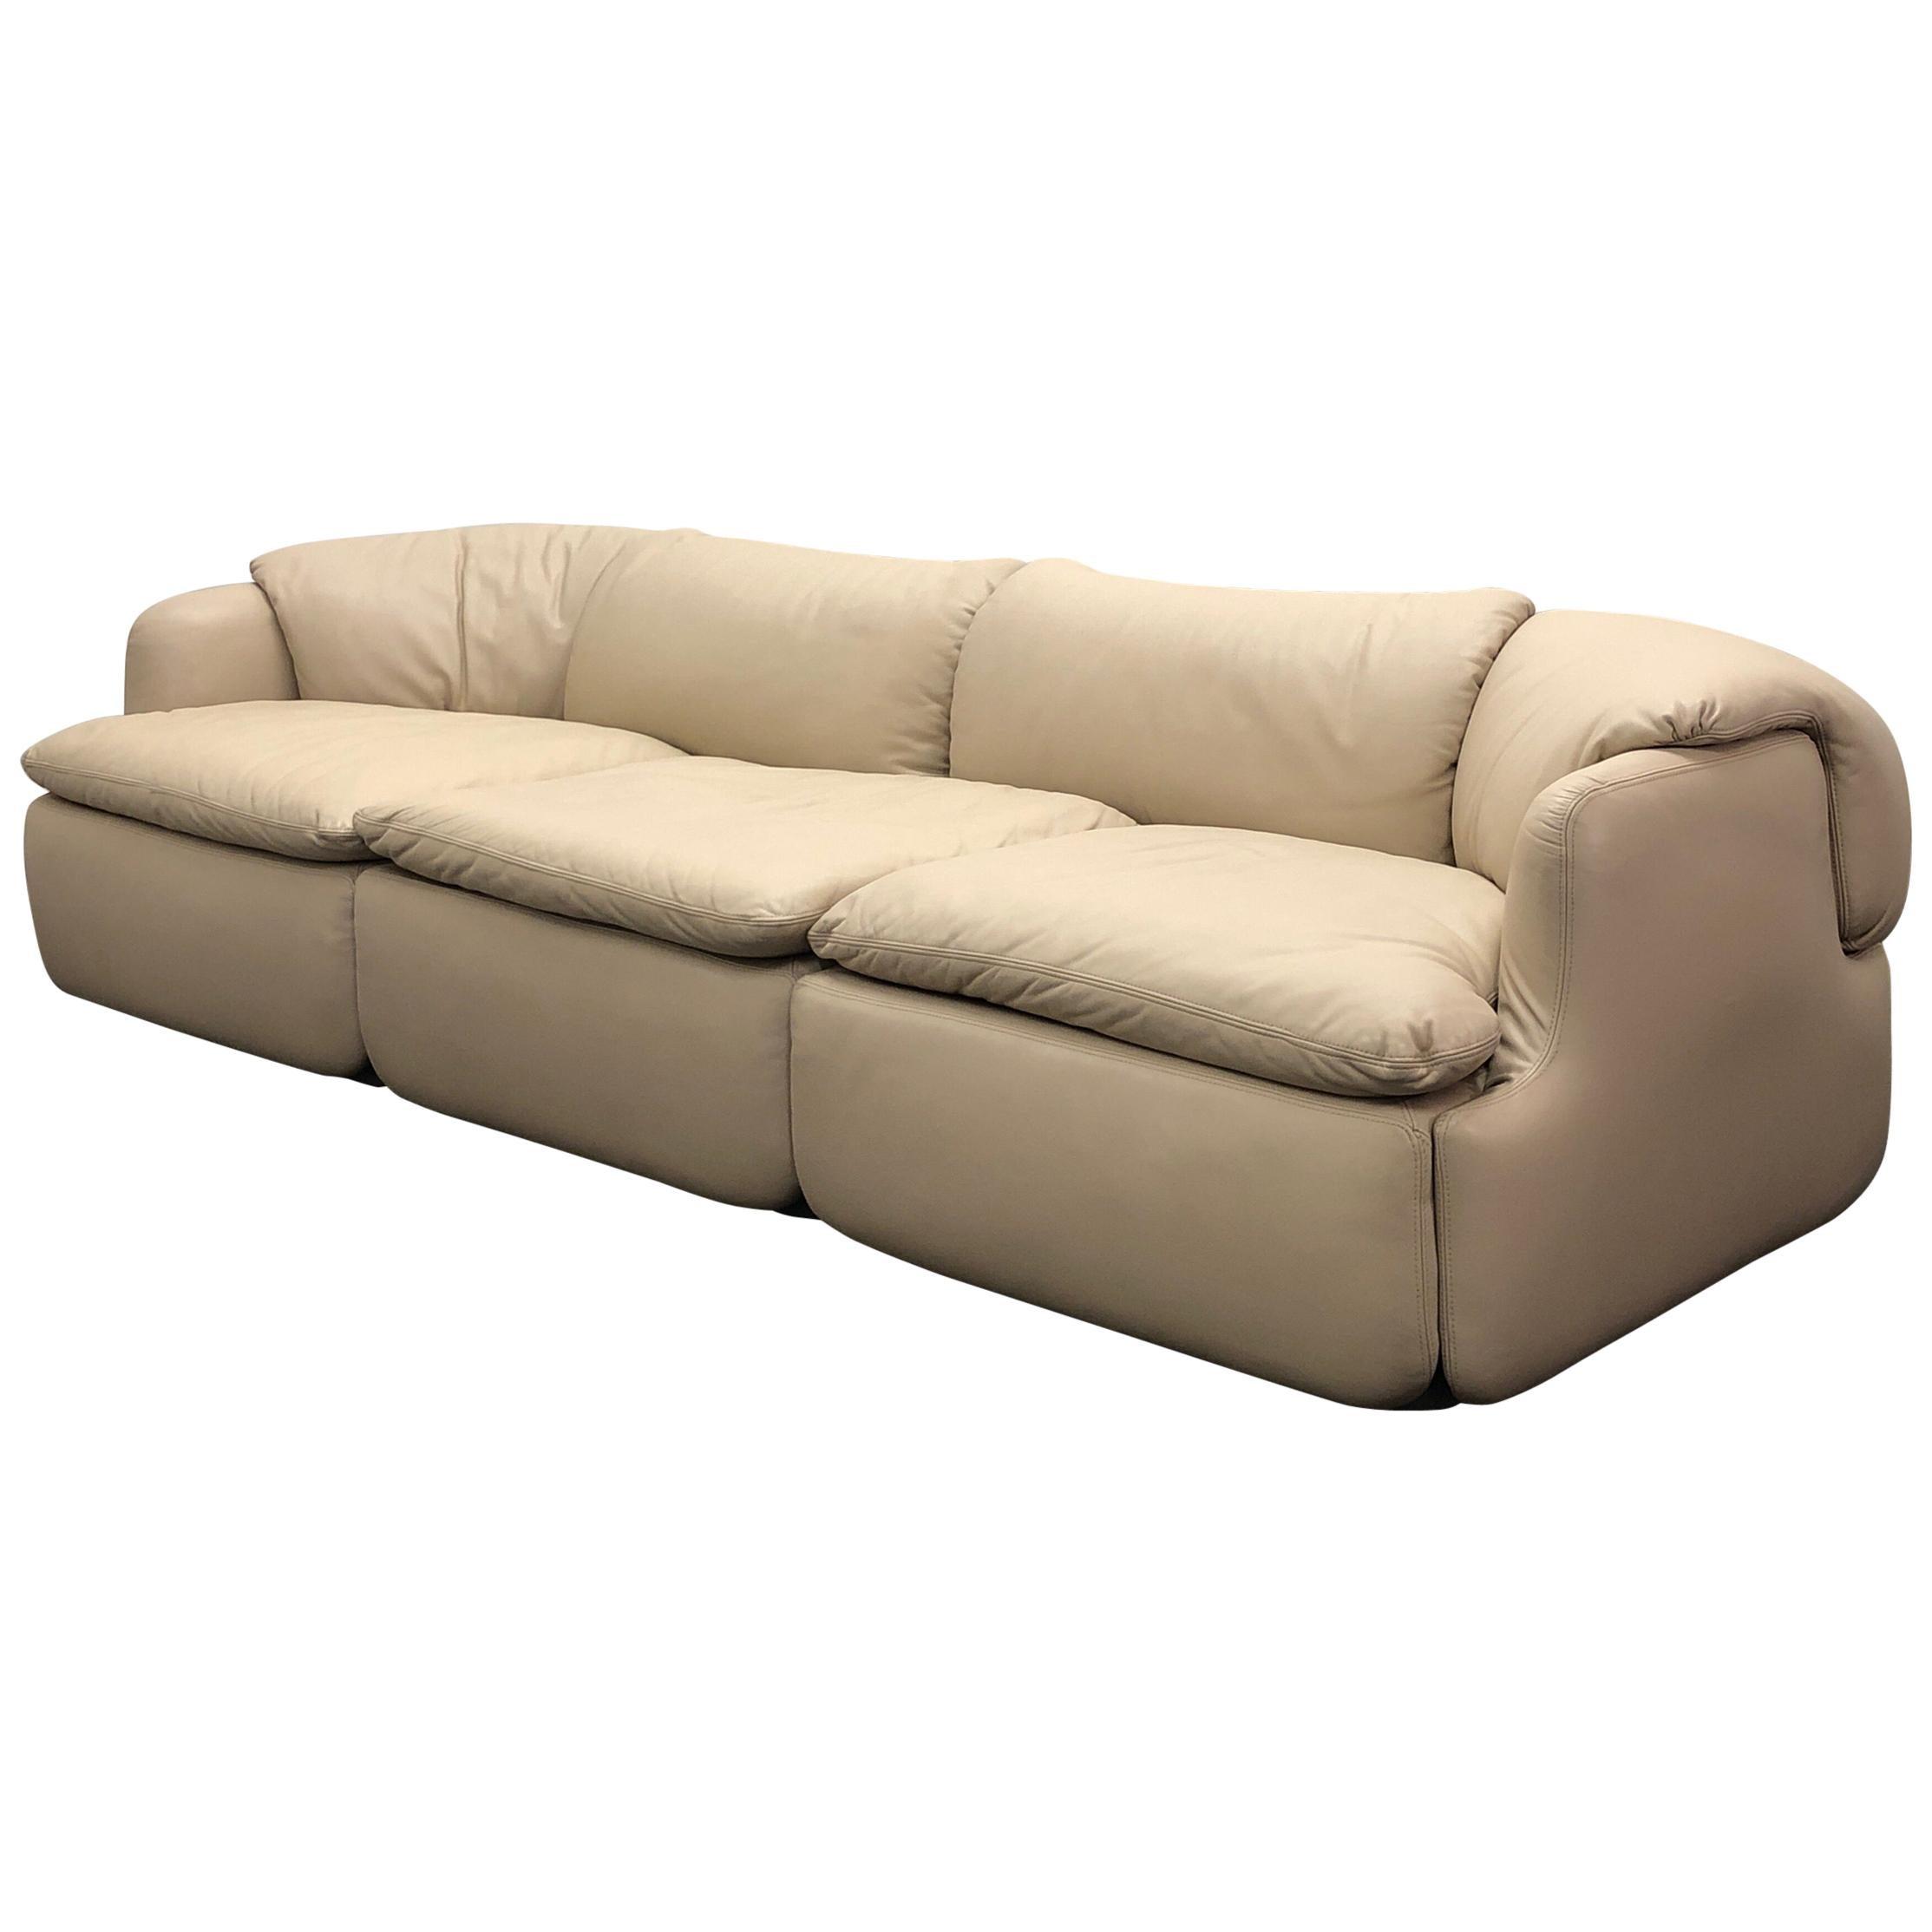 Italian Off White Leather Sofa by Alberto Rosselli for Saporiti